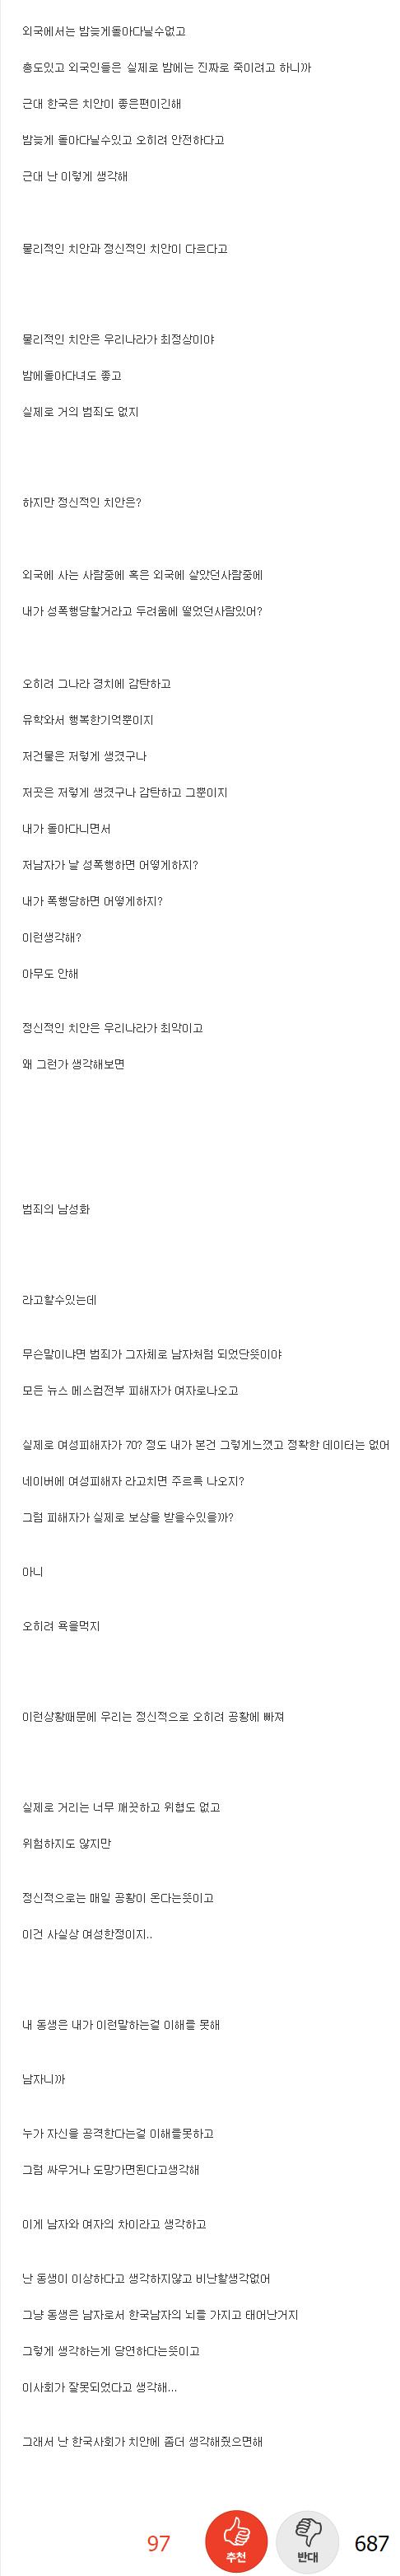 "1601265958816.png 한국 치안 좋다는거 다 거짓말인거 알아?"".jpg"